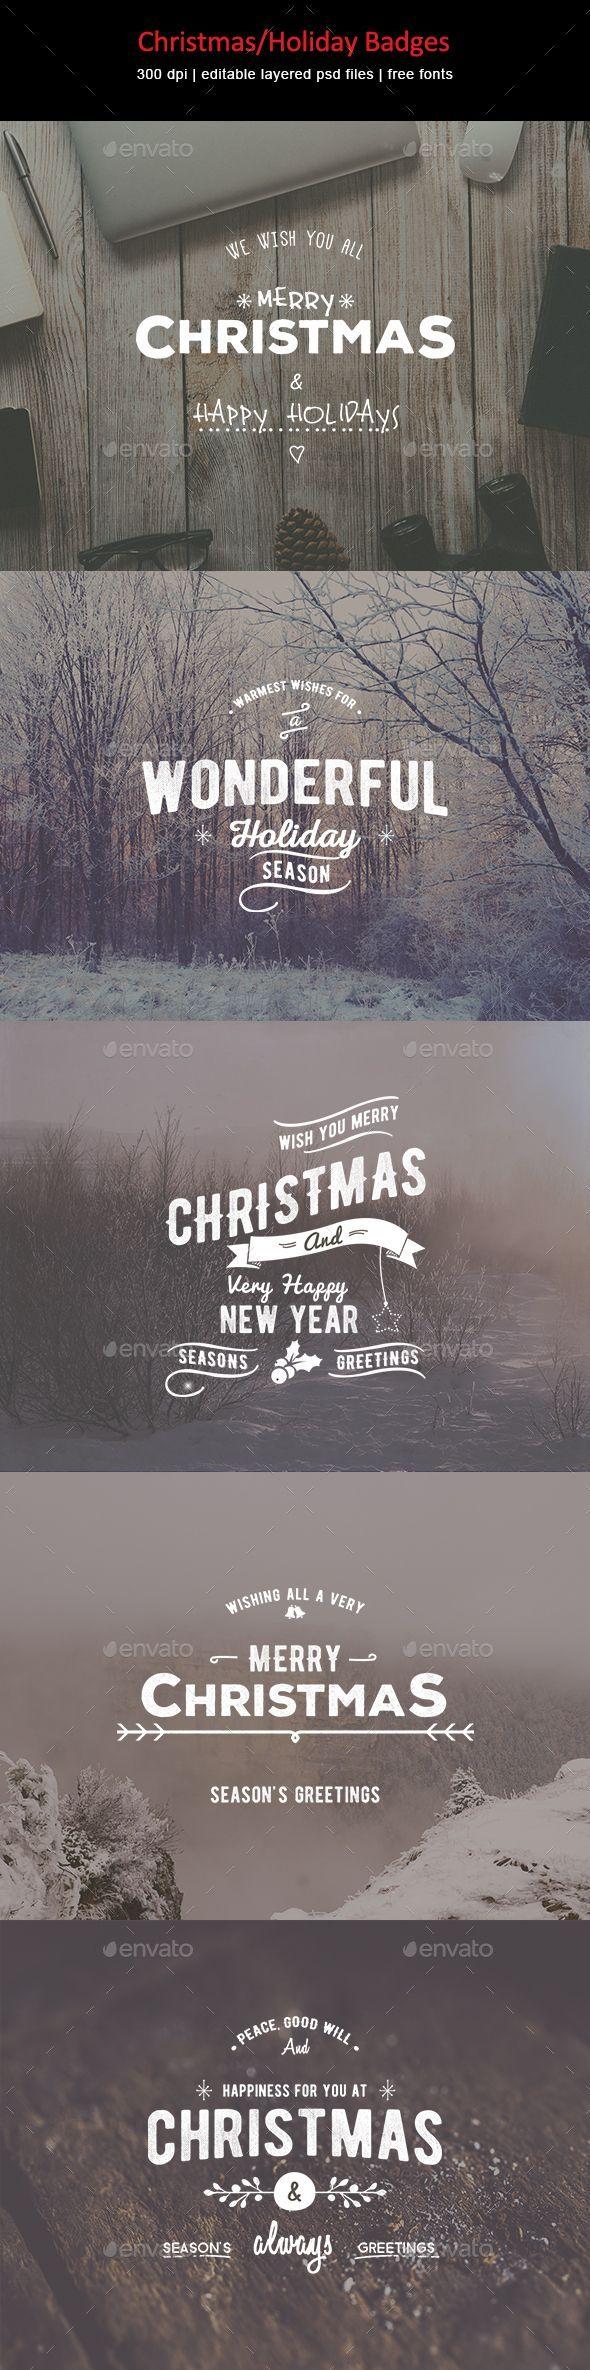 Christmas / Holiday Badges #design Download: http://graphicriver.net/item/christmasholiday-badges/13465335?ref=ksioks